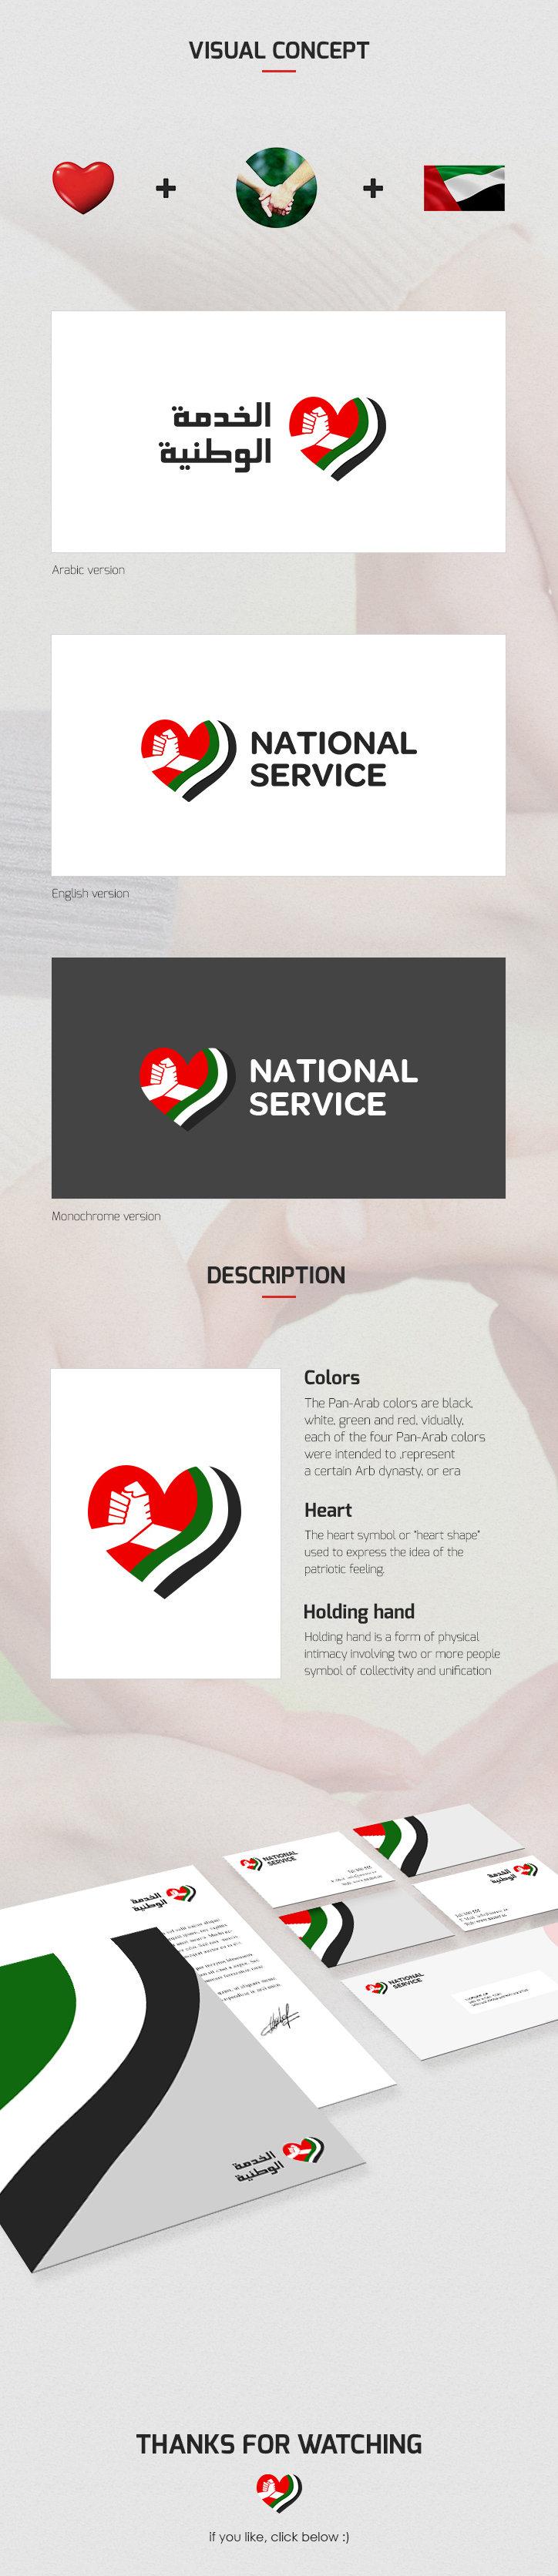 UAE l National Service